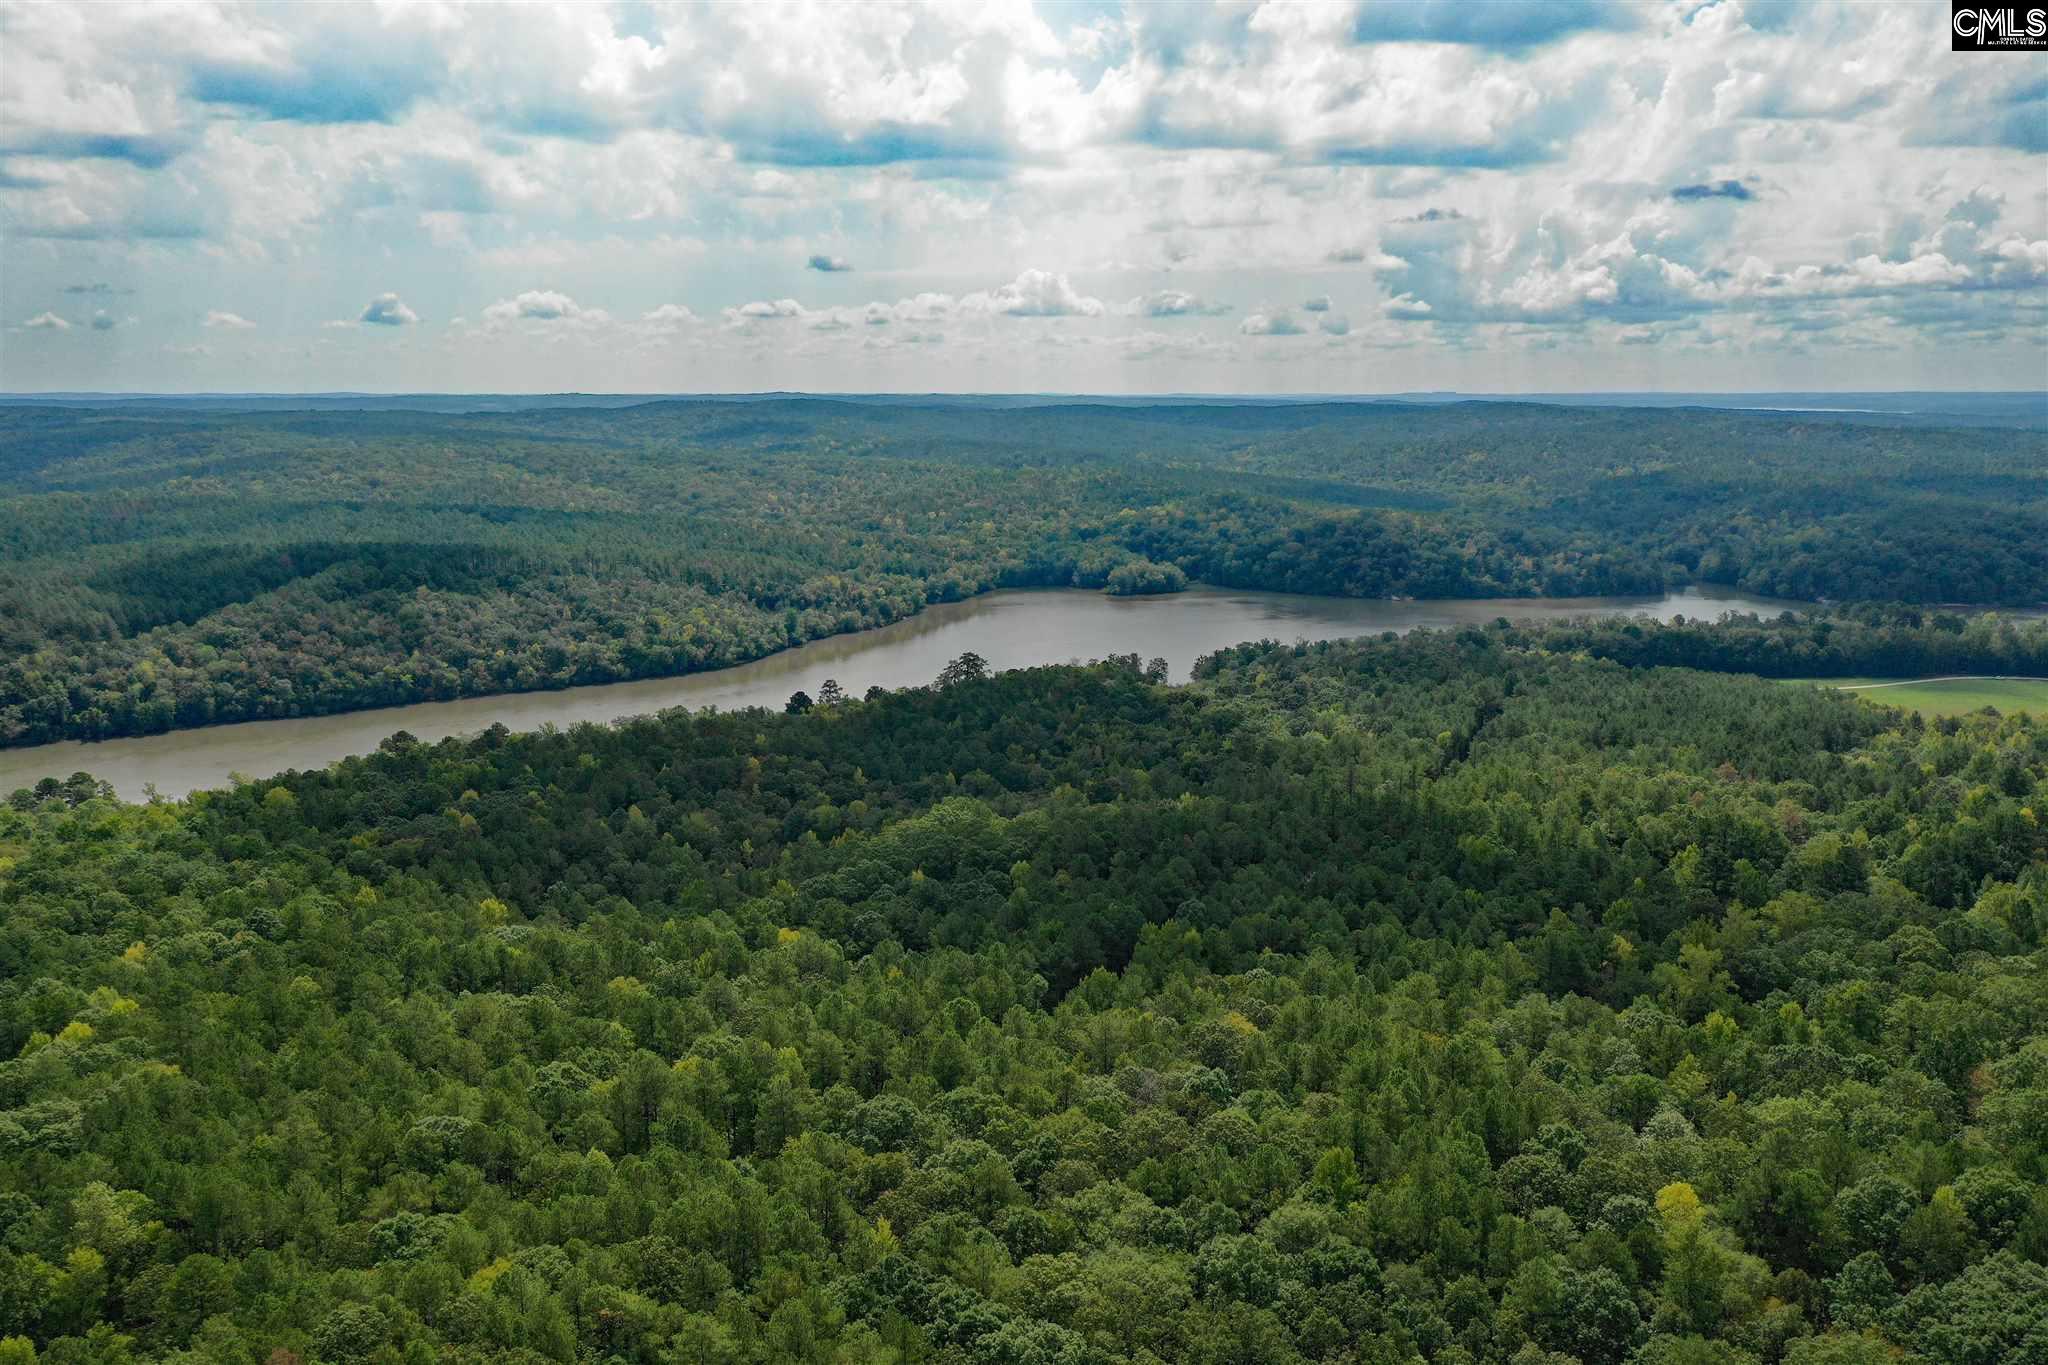 Arledge Lane Great Falls, SC 29055-0000